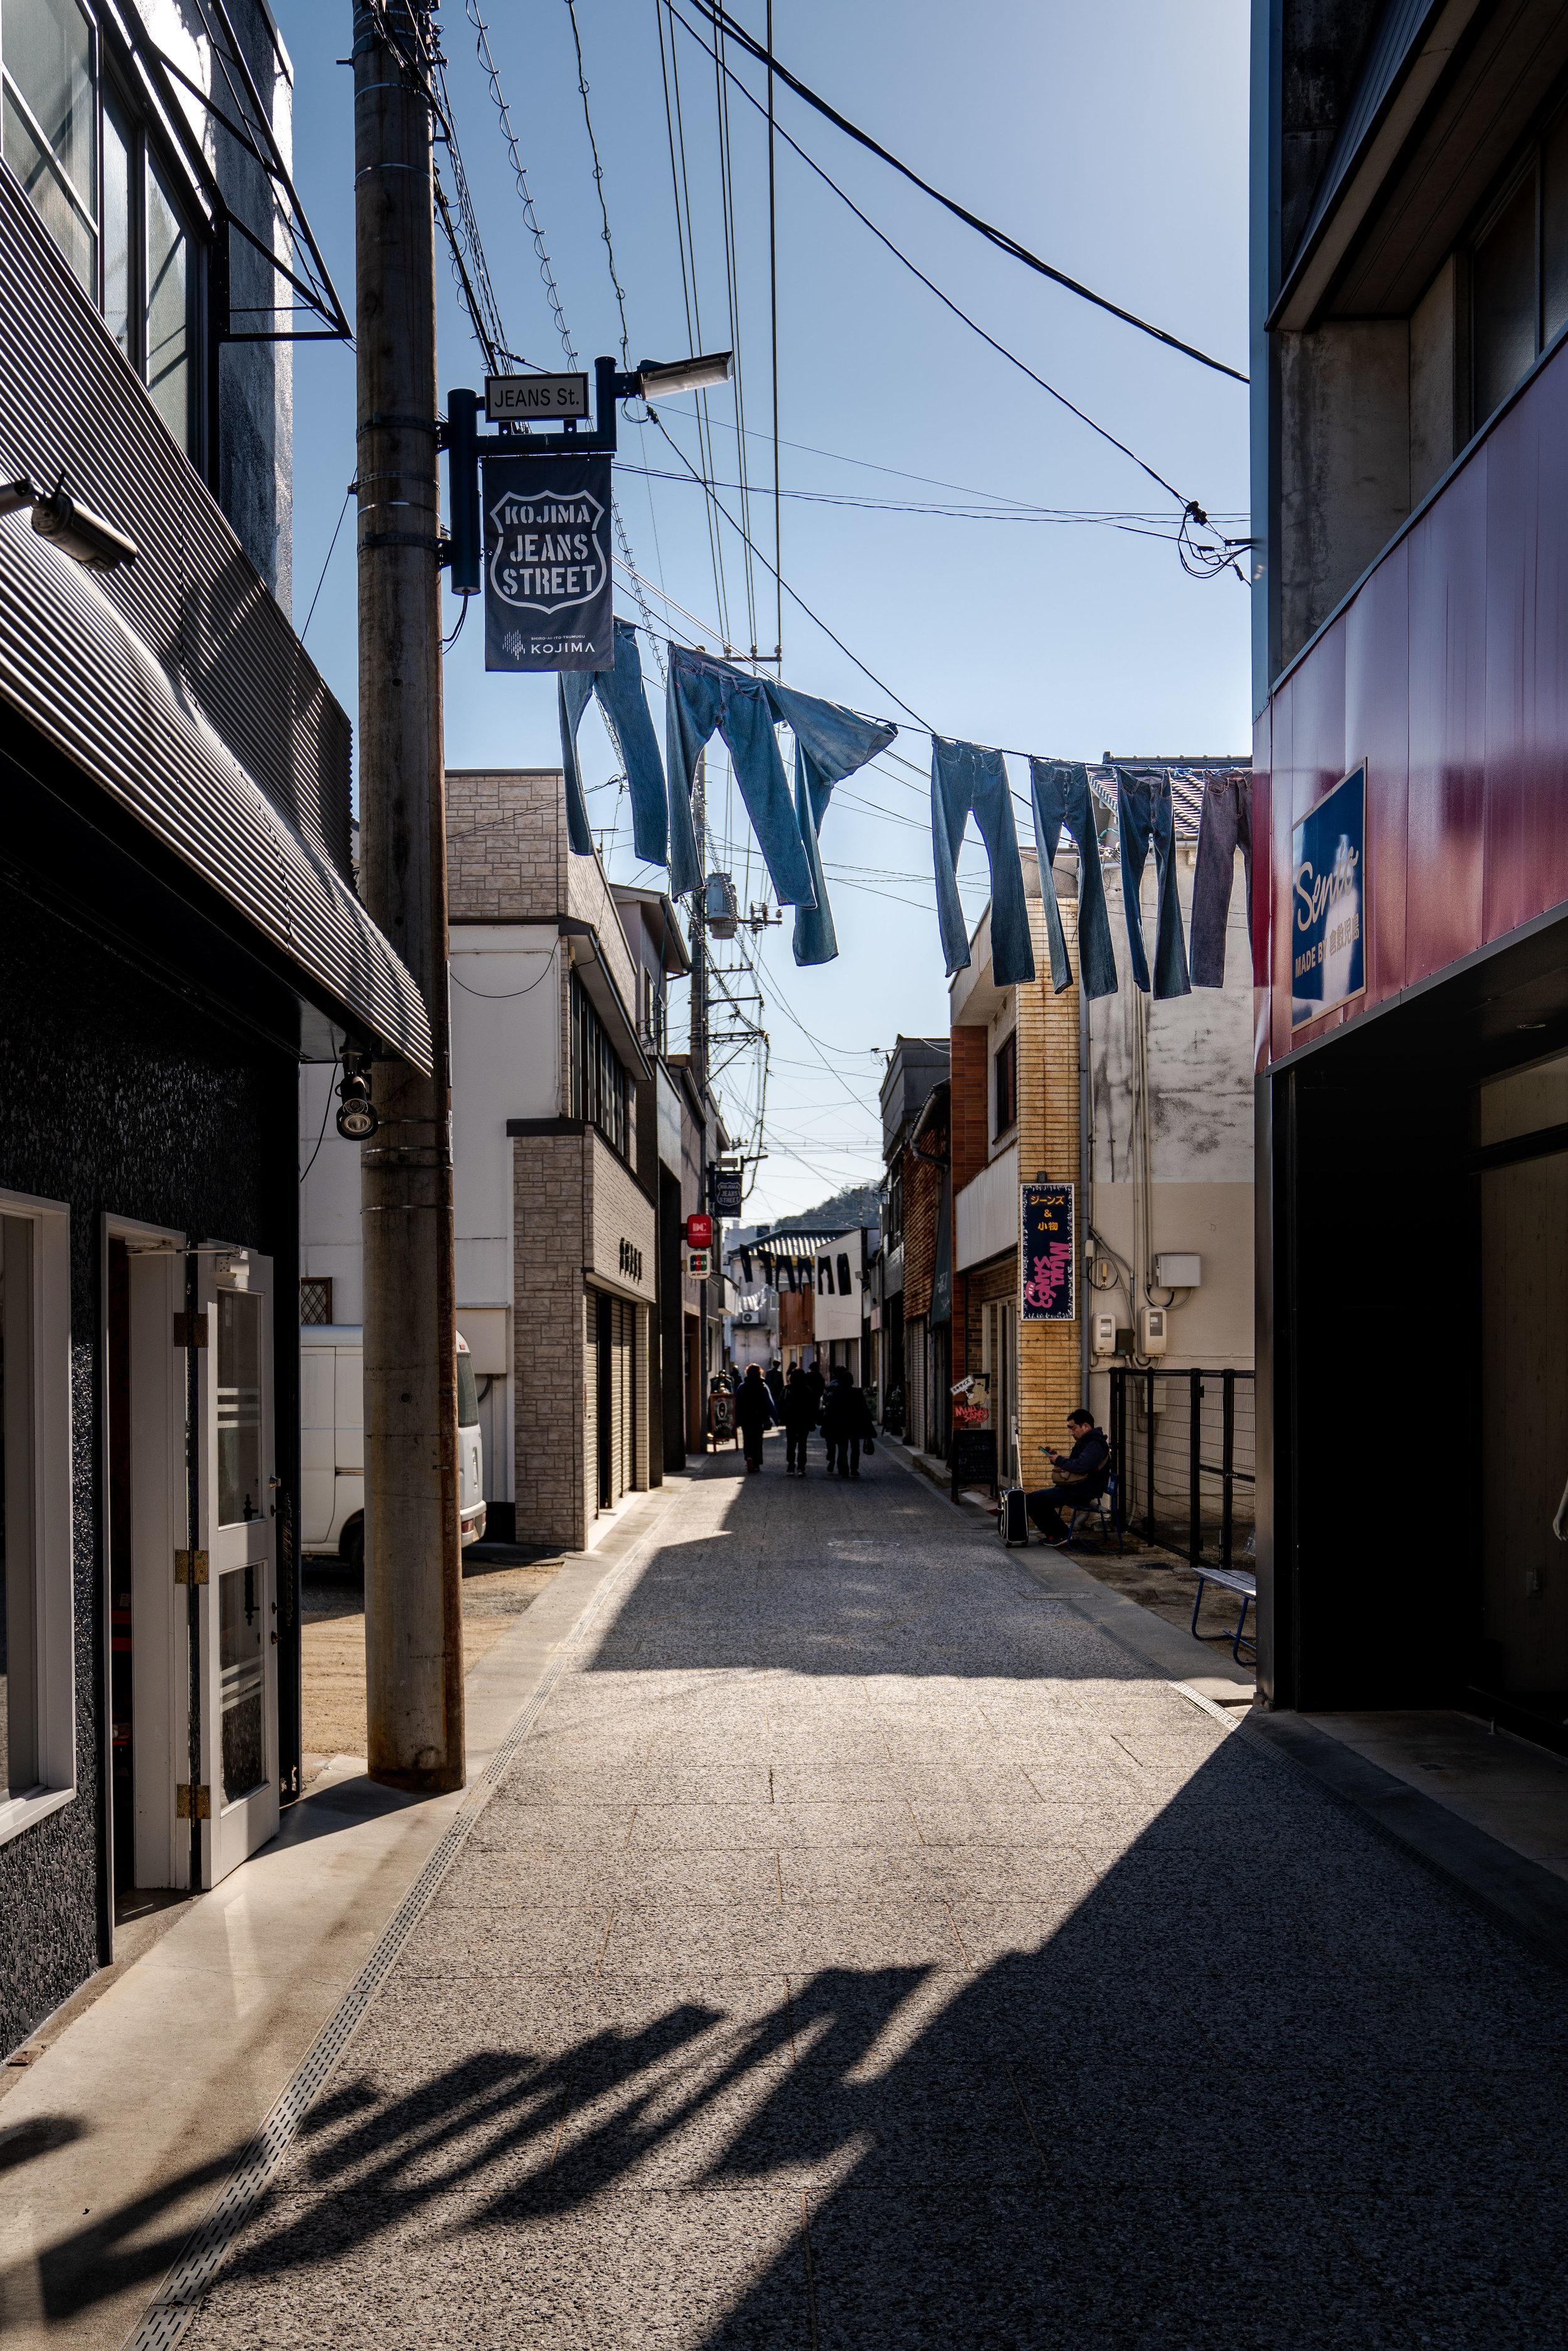 Kojima-Jeans-Street-Stenberg-0354.jpg